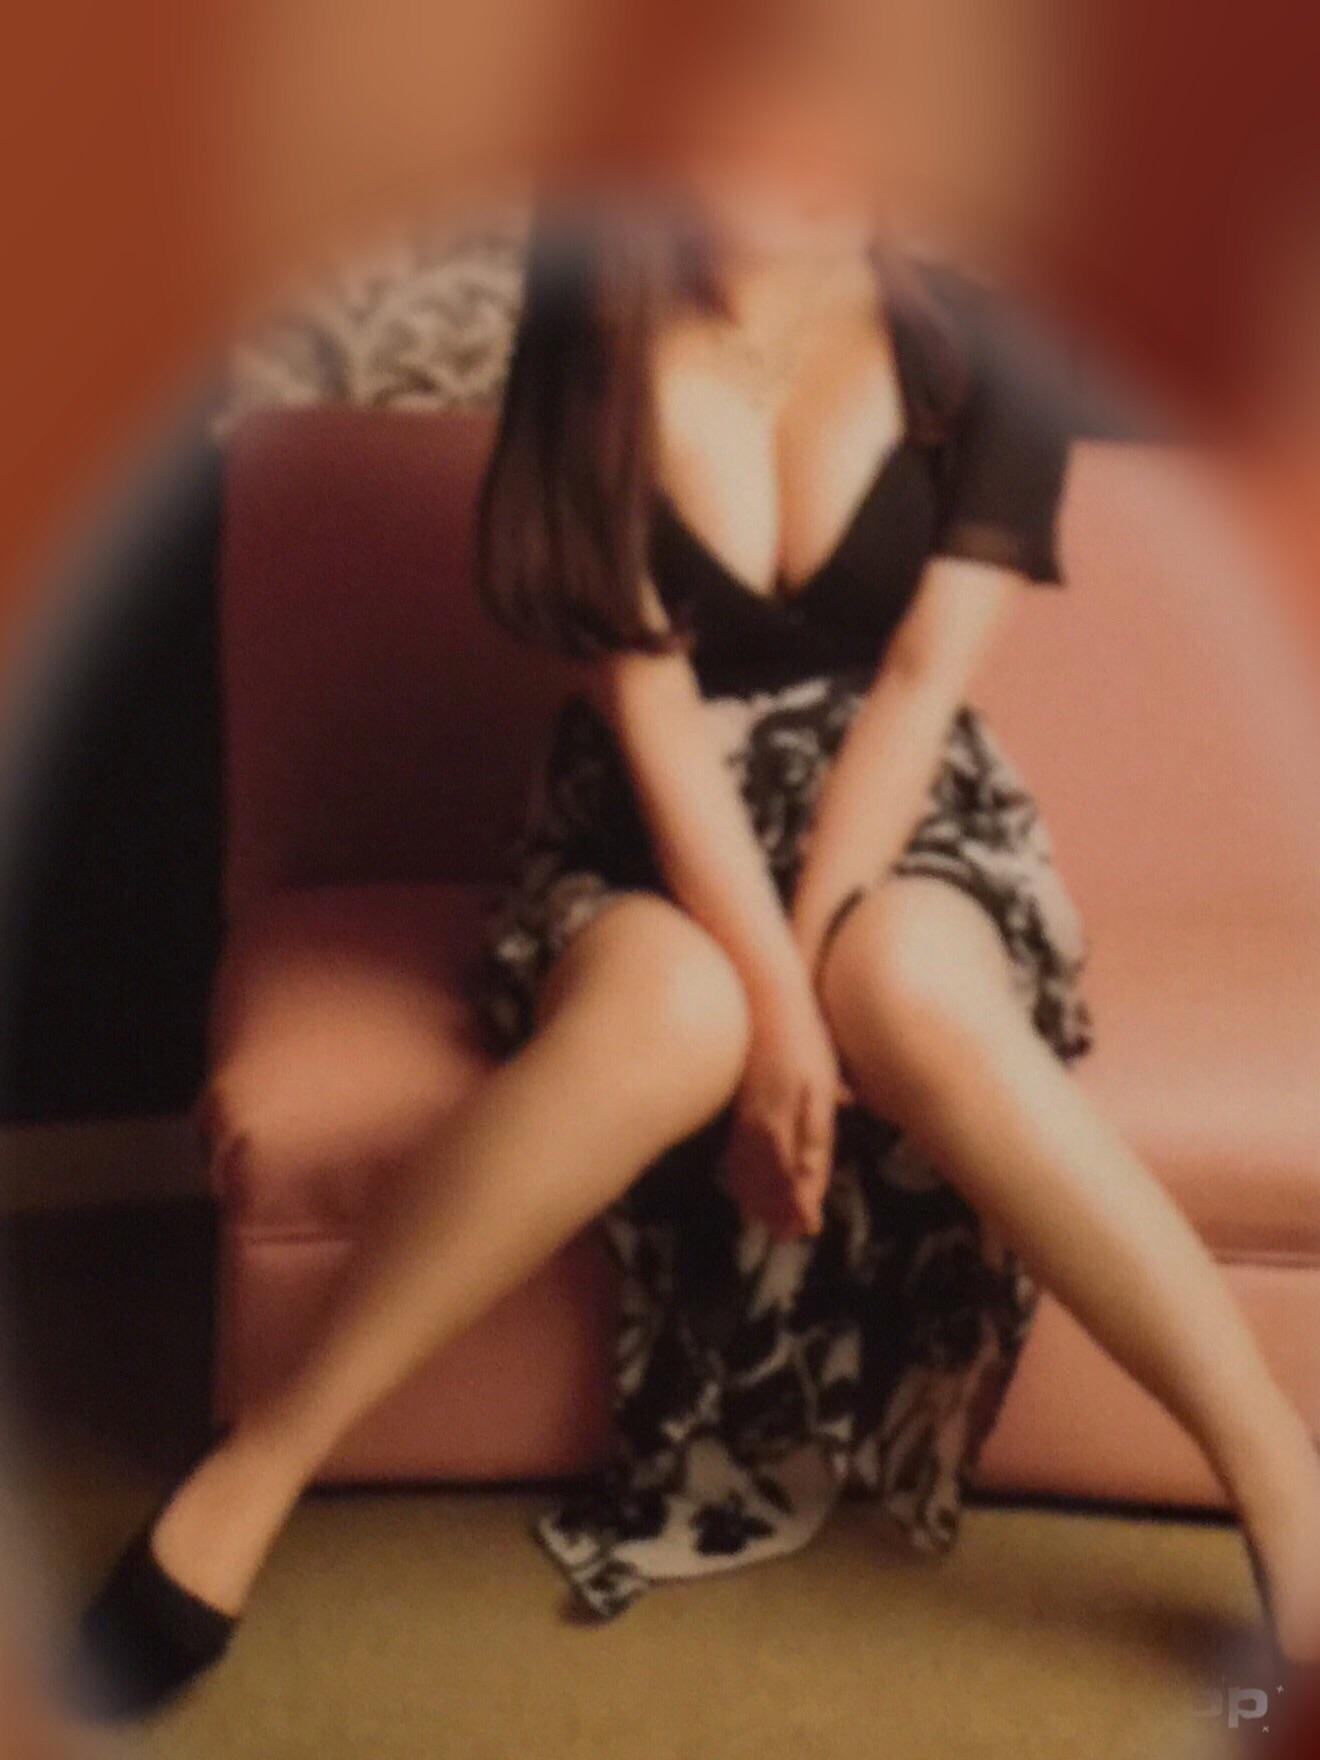 「成吉思汗」06/12(火) 15:20 | 立花の写メ・風俗動画